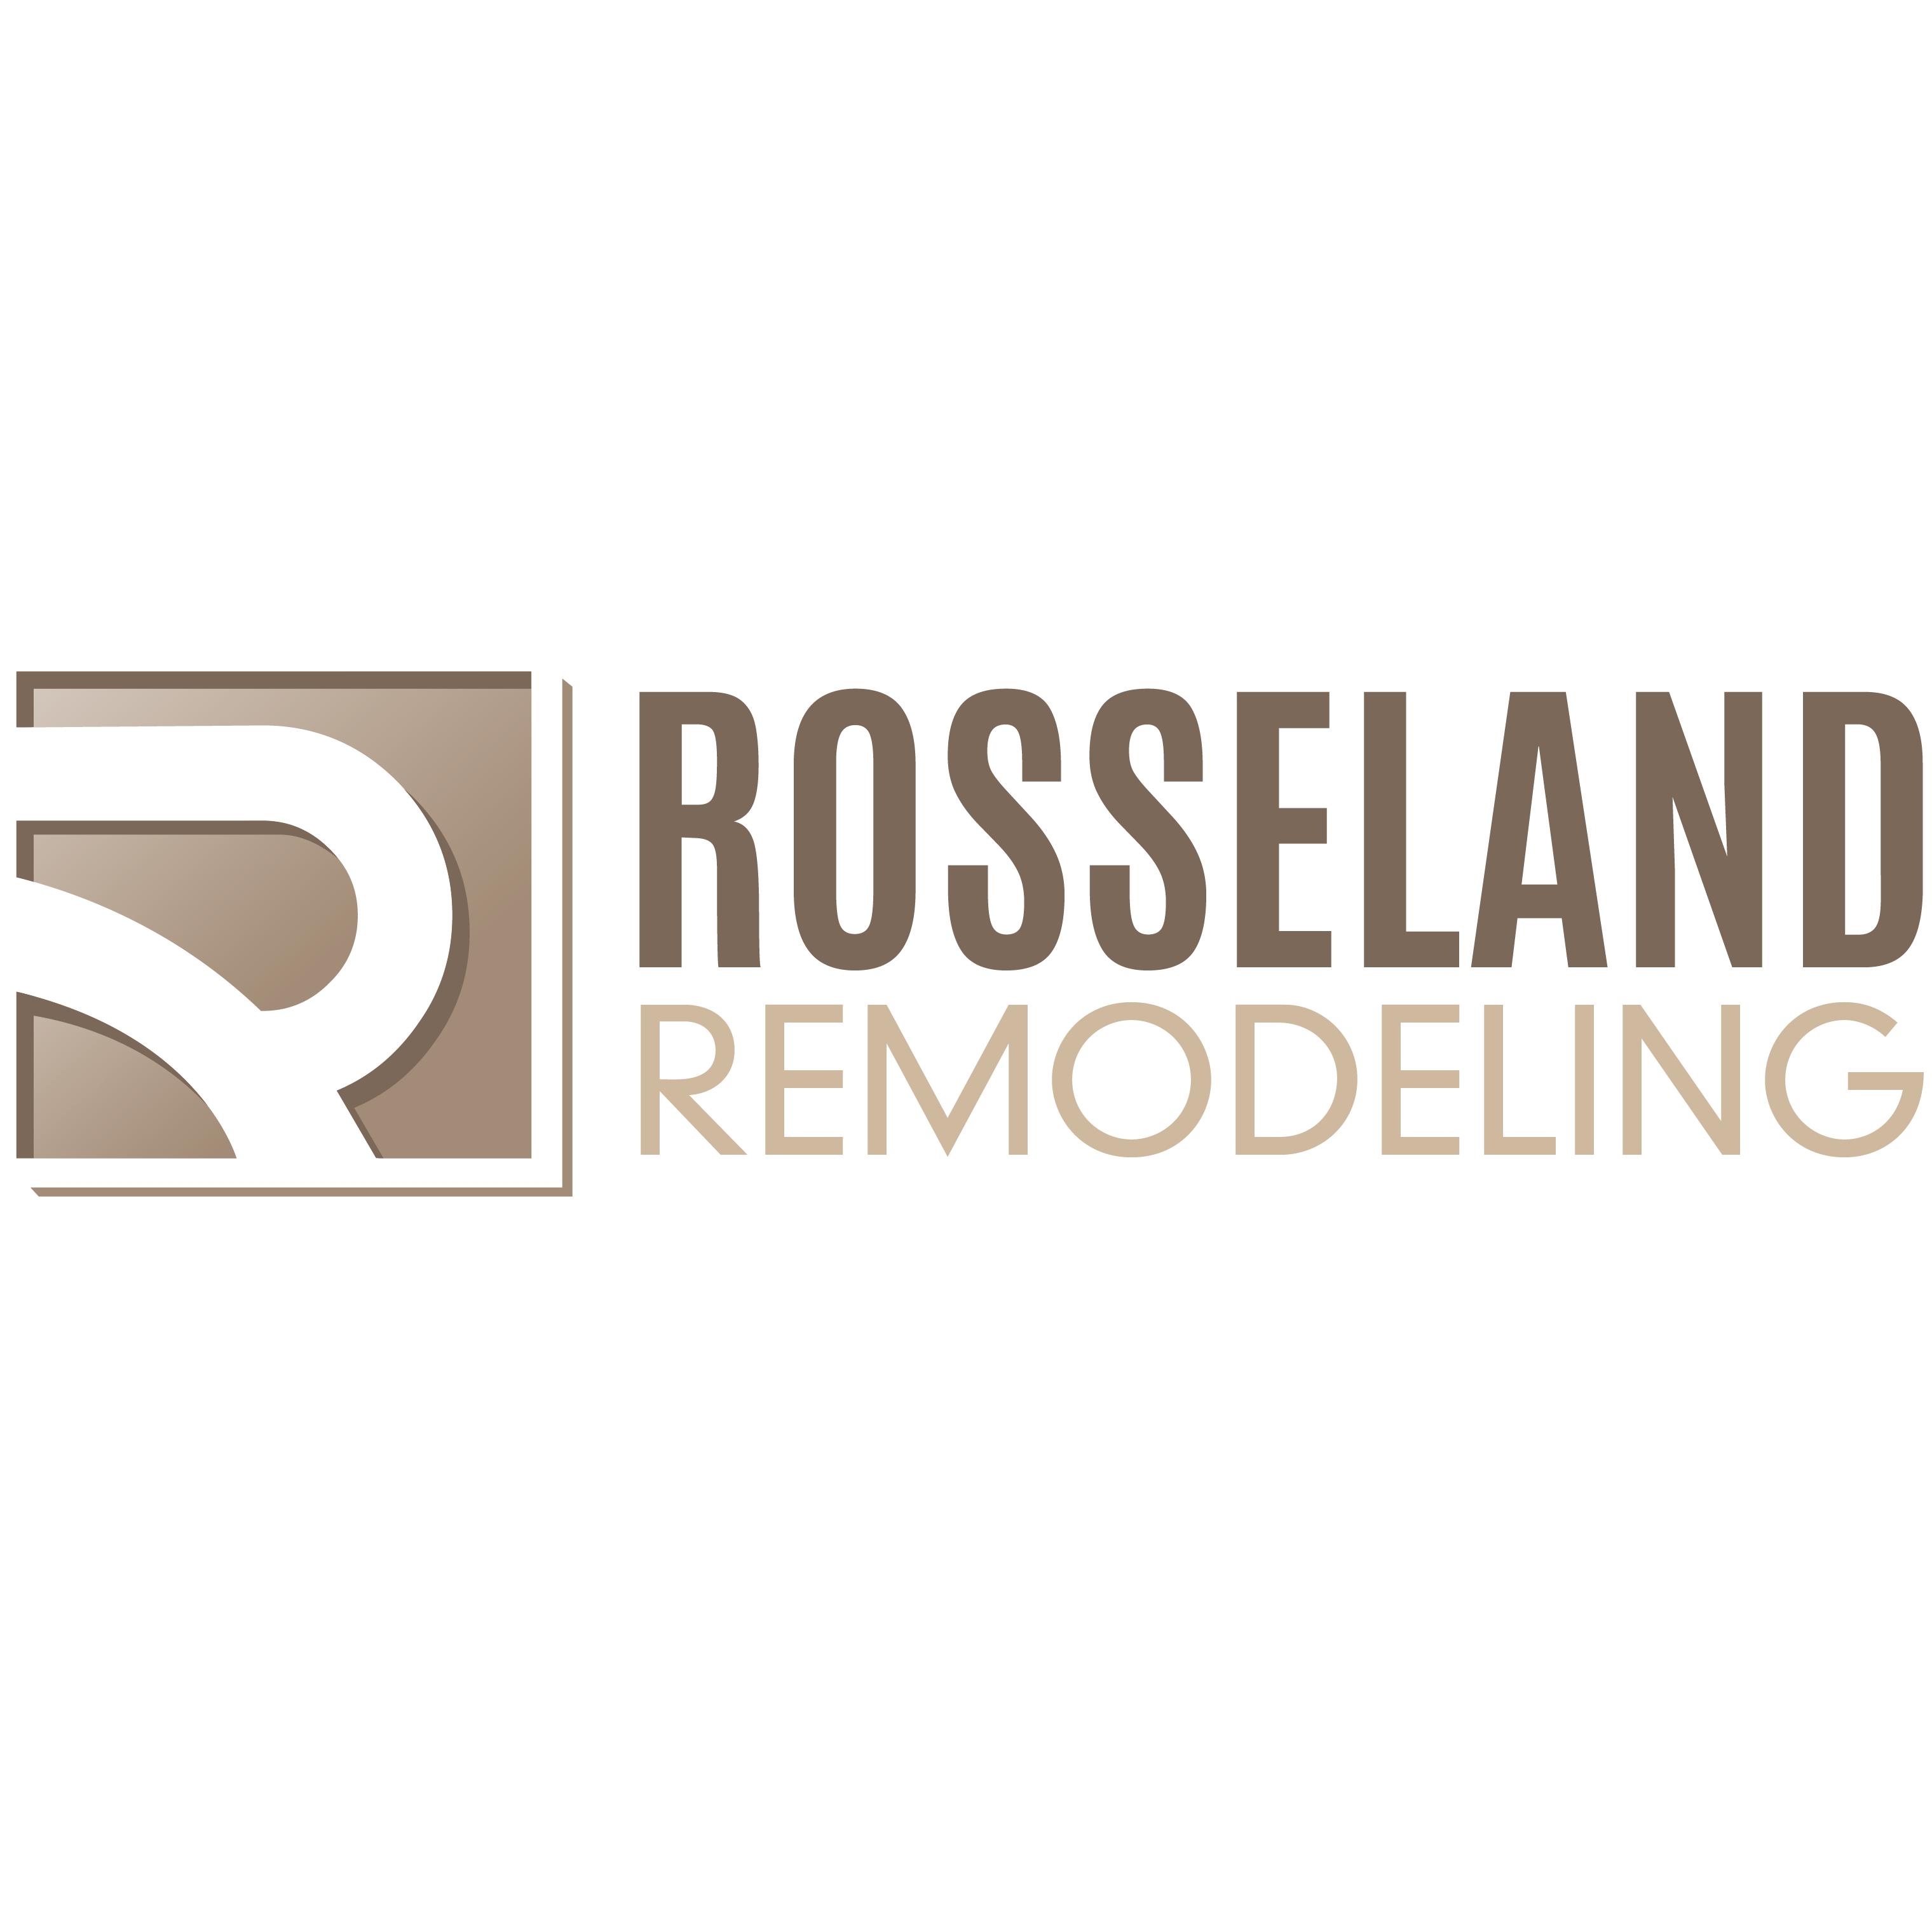 Rosseland Remodeling Bartlett Illinois Il